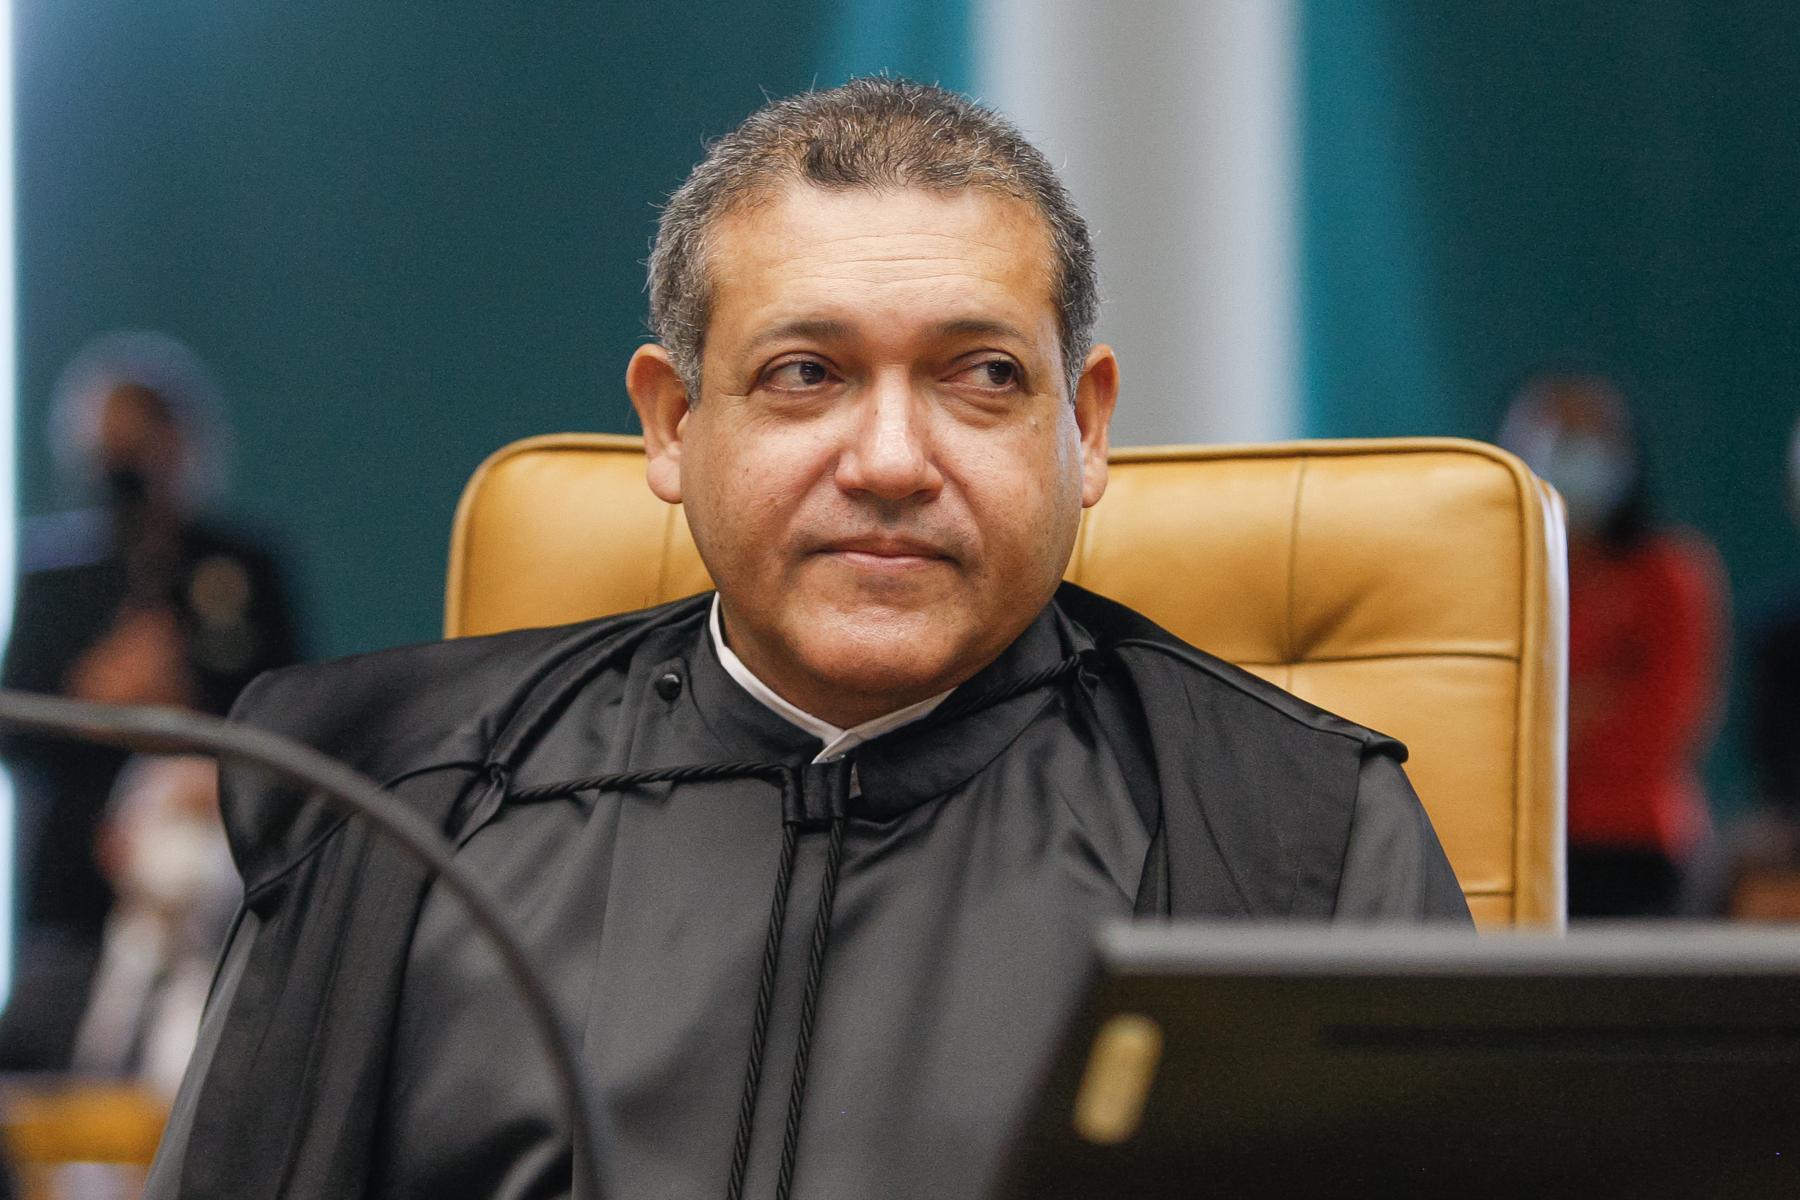 ministro-Nunes-Marques